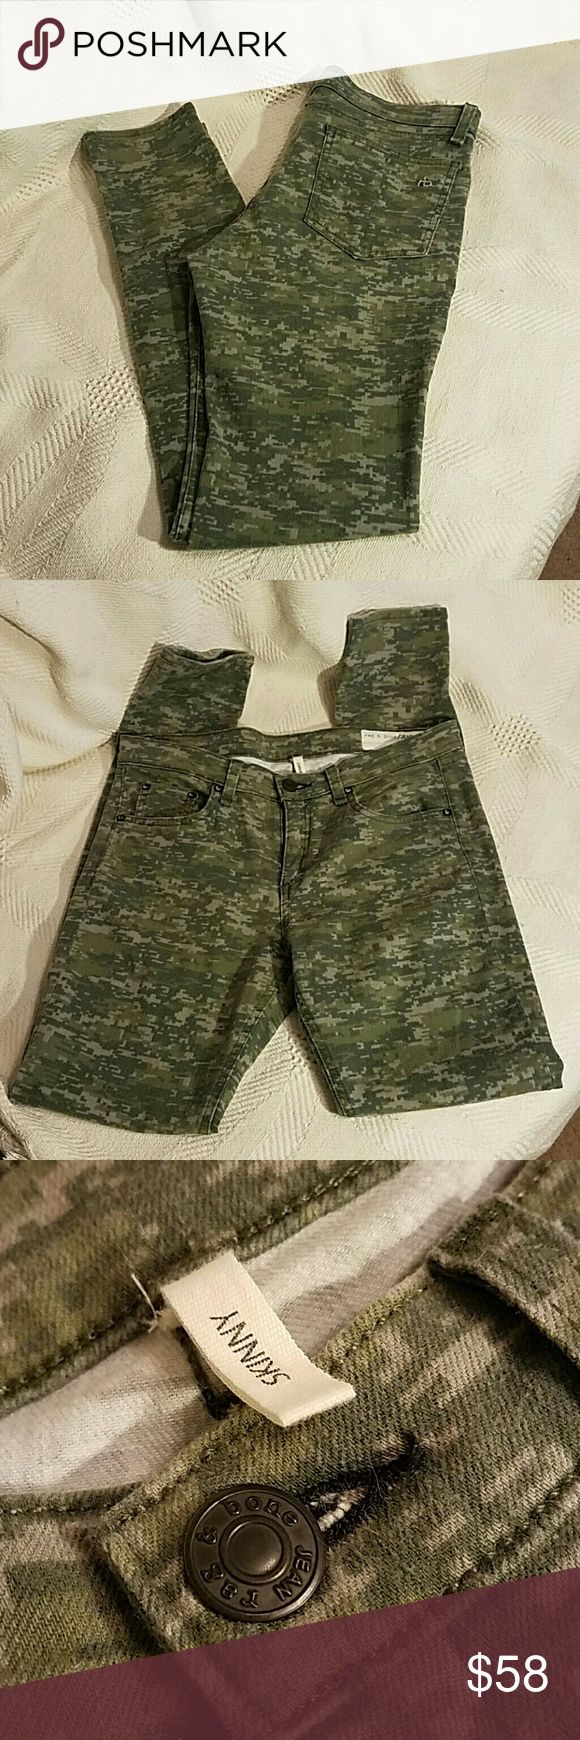 "Rag & BONE Skinny Jeans Camo size 29 Great Used Condition Camo Skinny Jeans Measurements Waist 30"" Rise 9"" Inseam 29"" Rag & Bone Jeans Skinny"